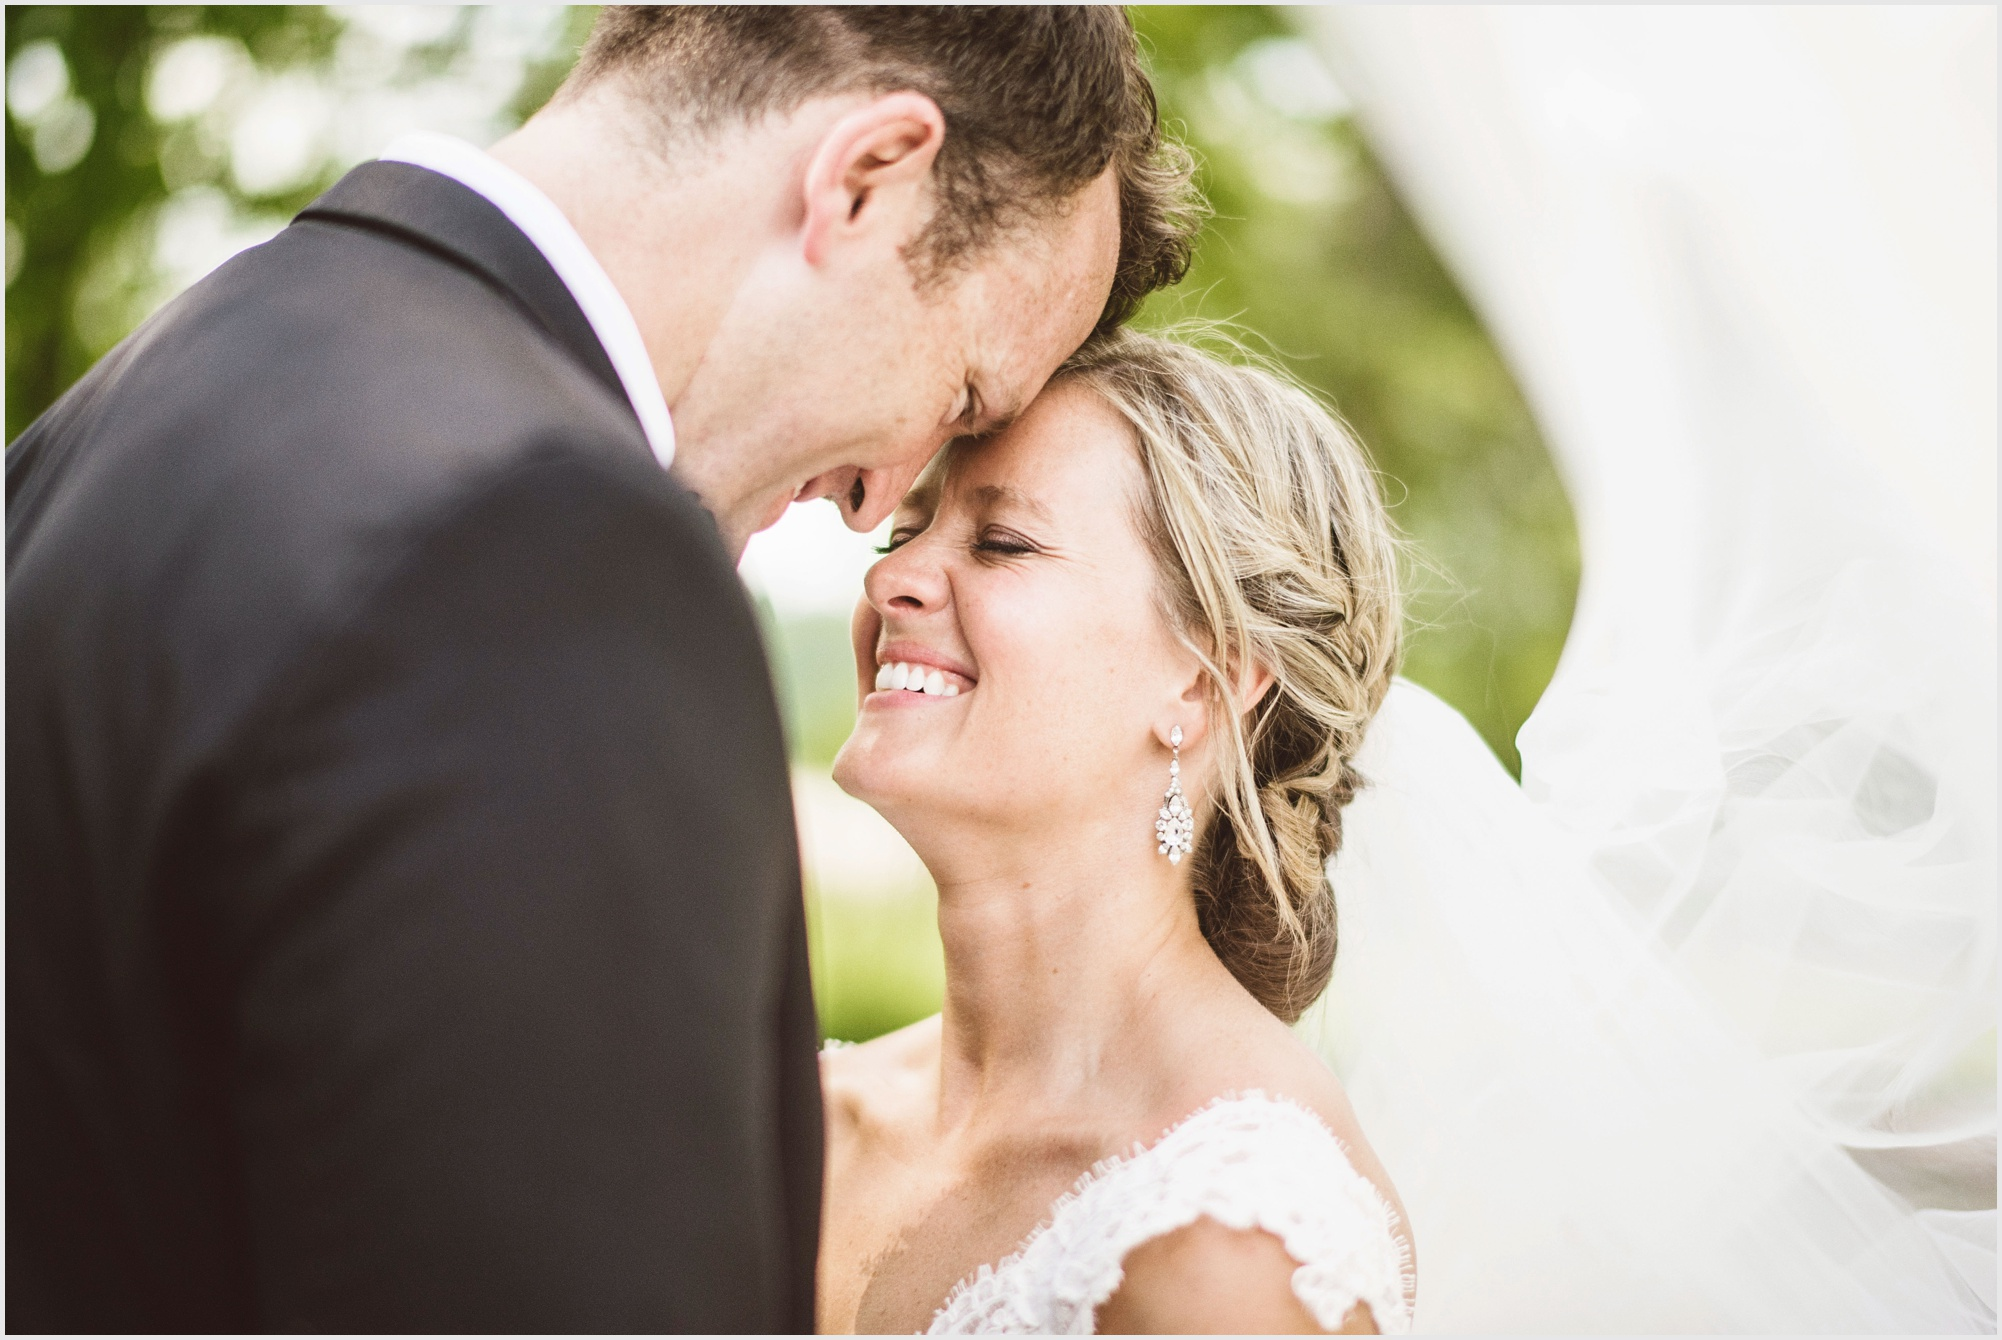 maura_david_james_j_hill_wedding_lucas_botz_photography_030.jpg